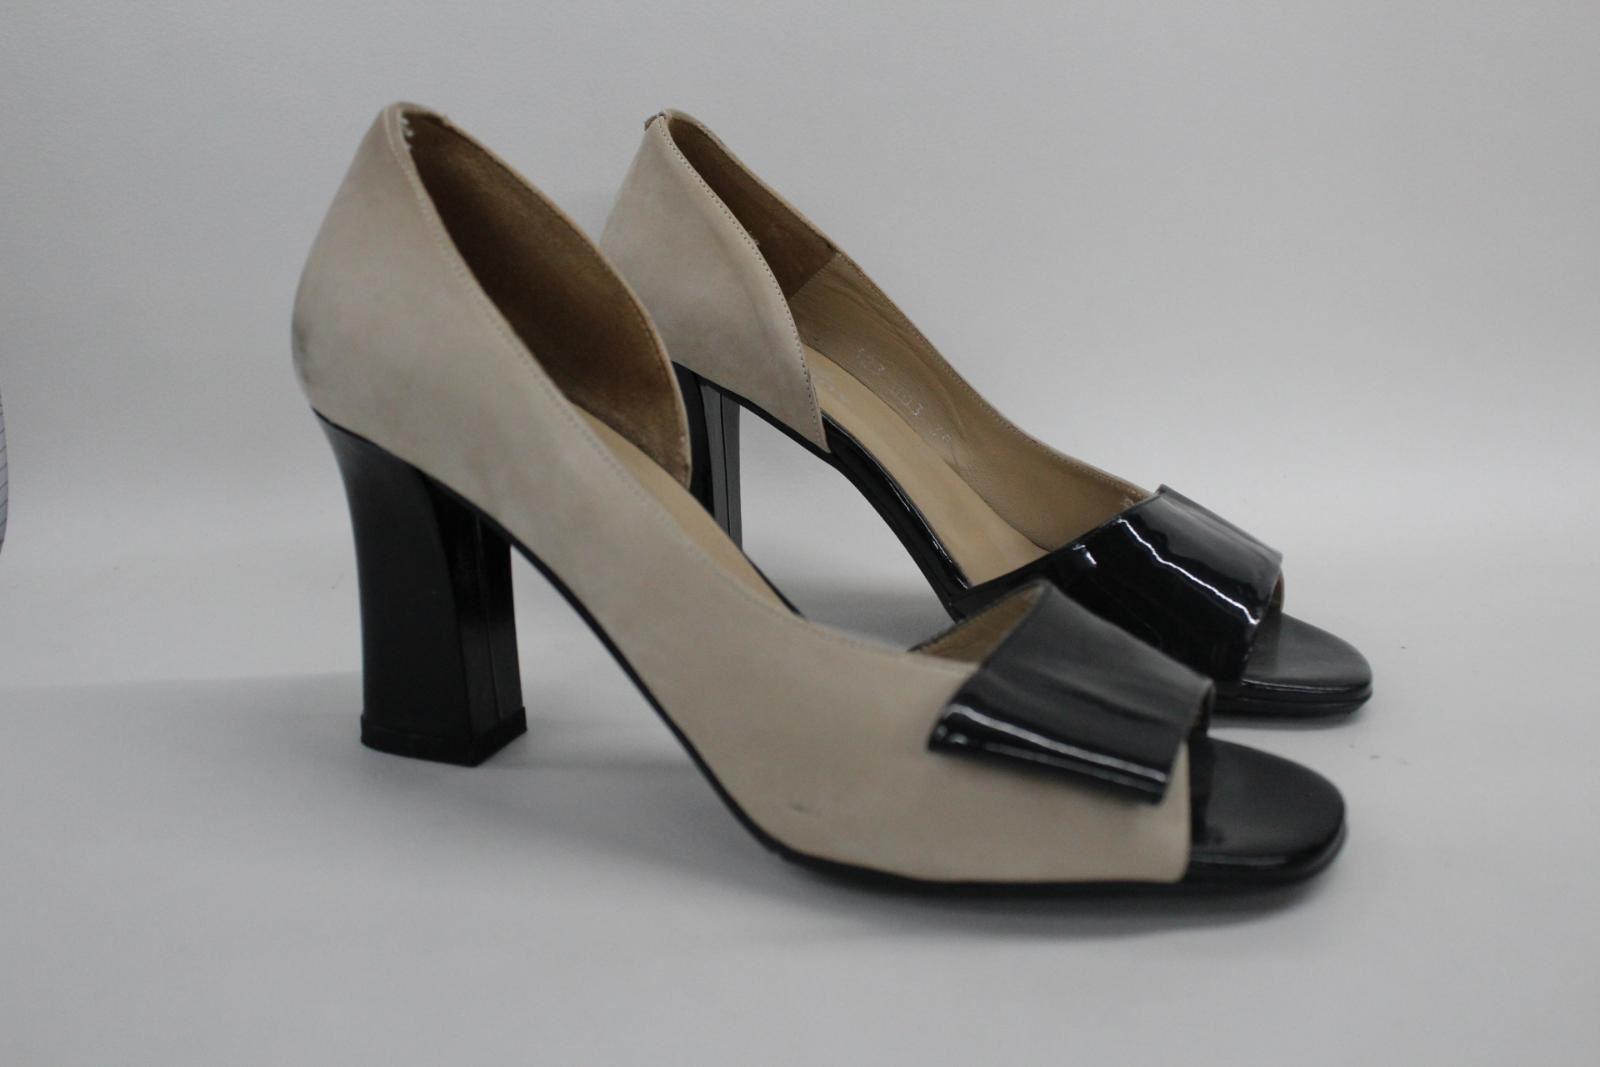 AUDLEY-London-Beige-Leather-Open-Peep-Toe-Bloc-Heel-Court-Shoes-EU39-UK6